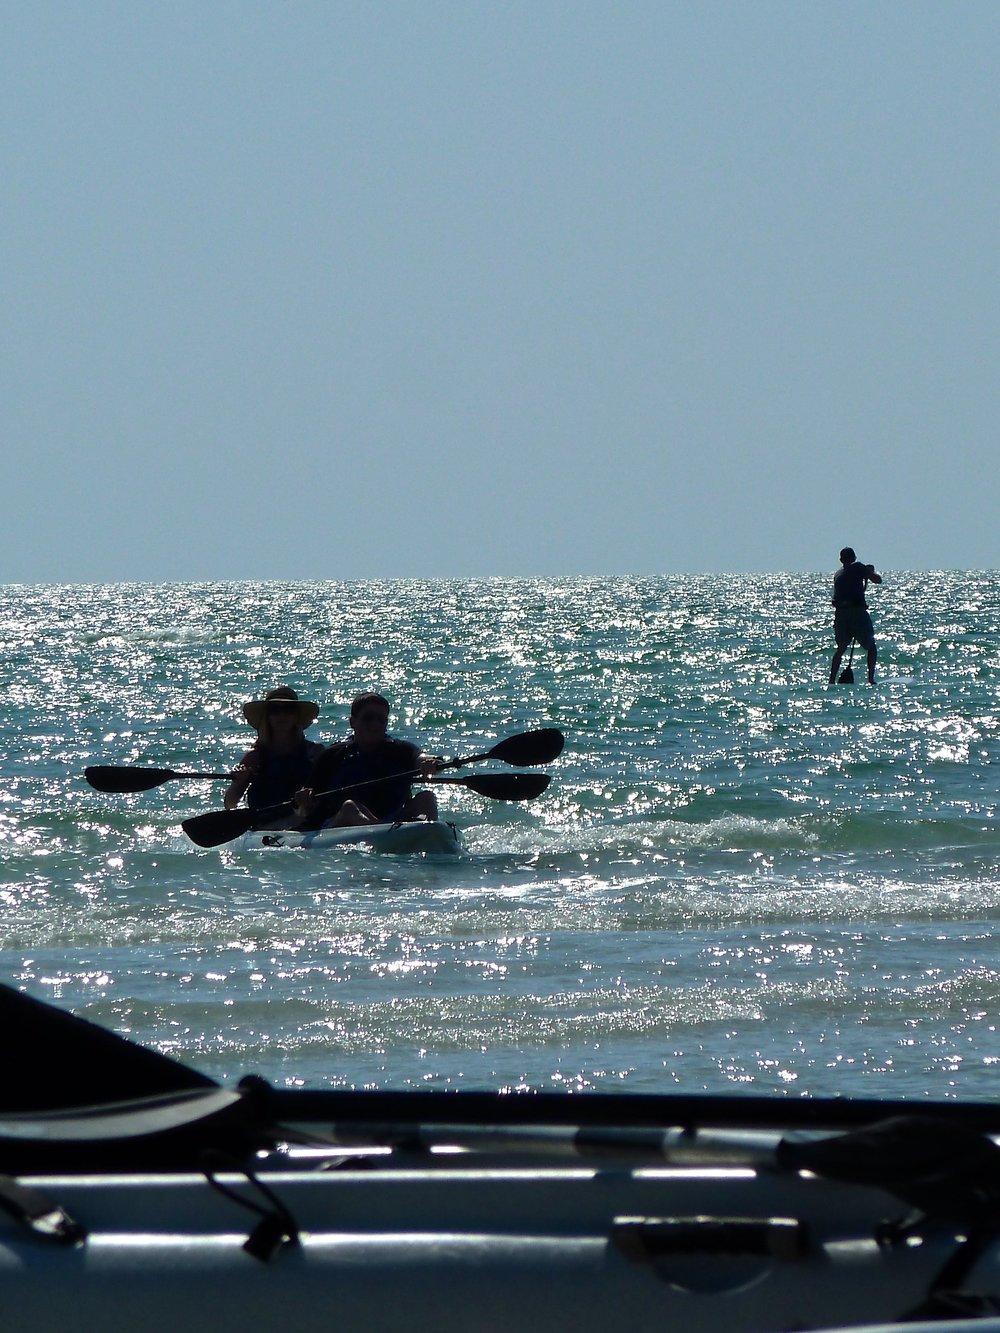 cindi_longboatkey_beach_canoe&paddleboard_spiritedtable_photo1.jpg